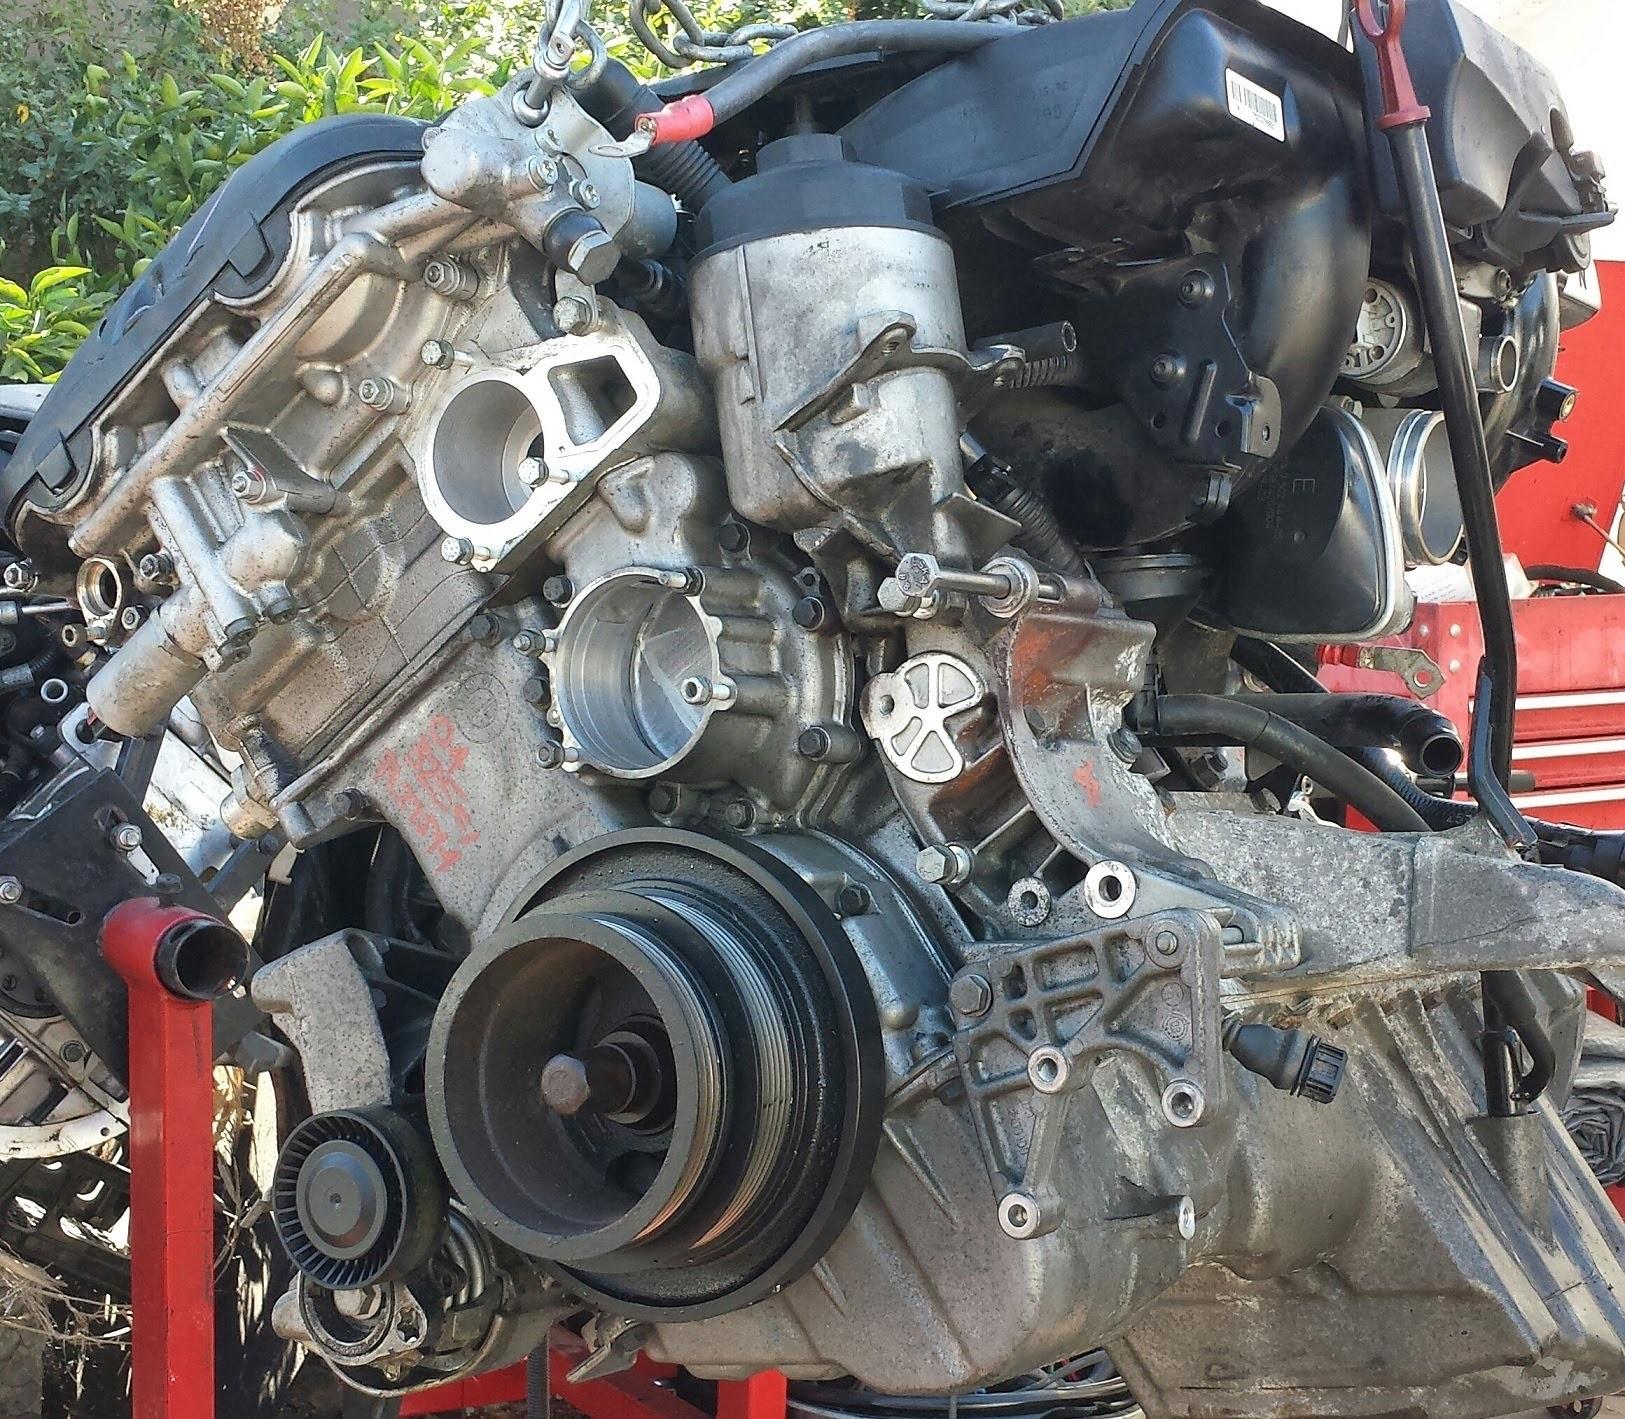 2000 bmw 323i parts diagram bmw m54b30 engine sensors and parts rh detoxicrecenze com 2007 BMW 328 Vacuum Diagram 2000 BMW E46 Fuse Diagram